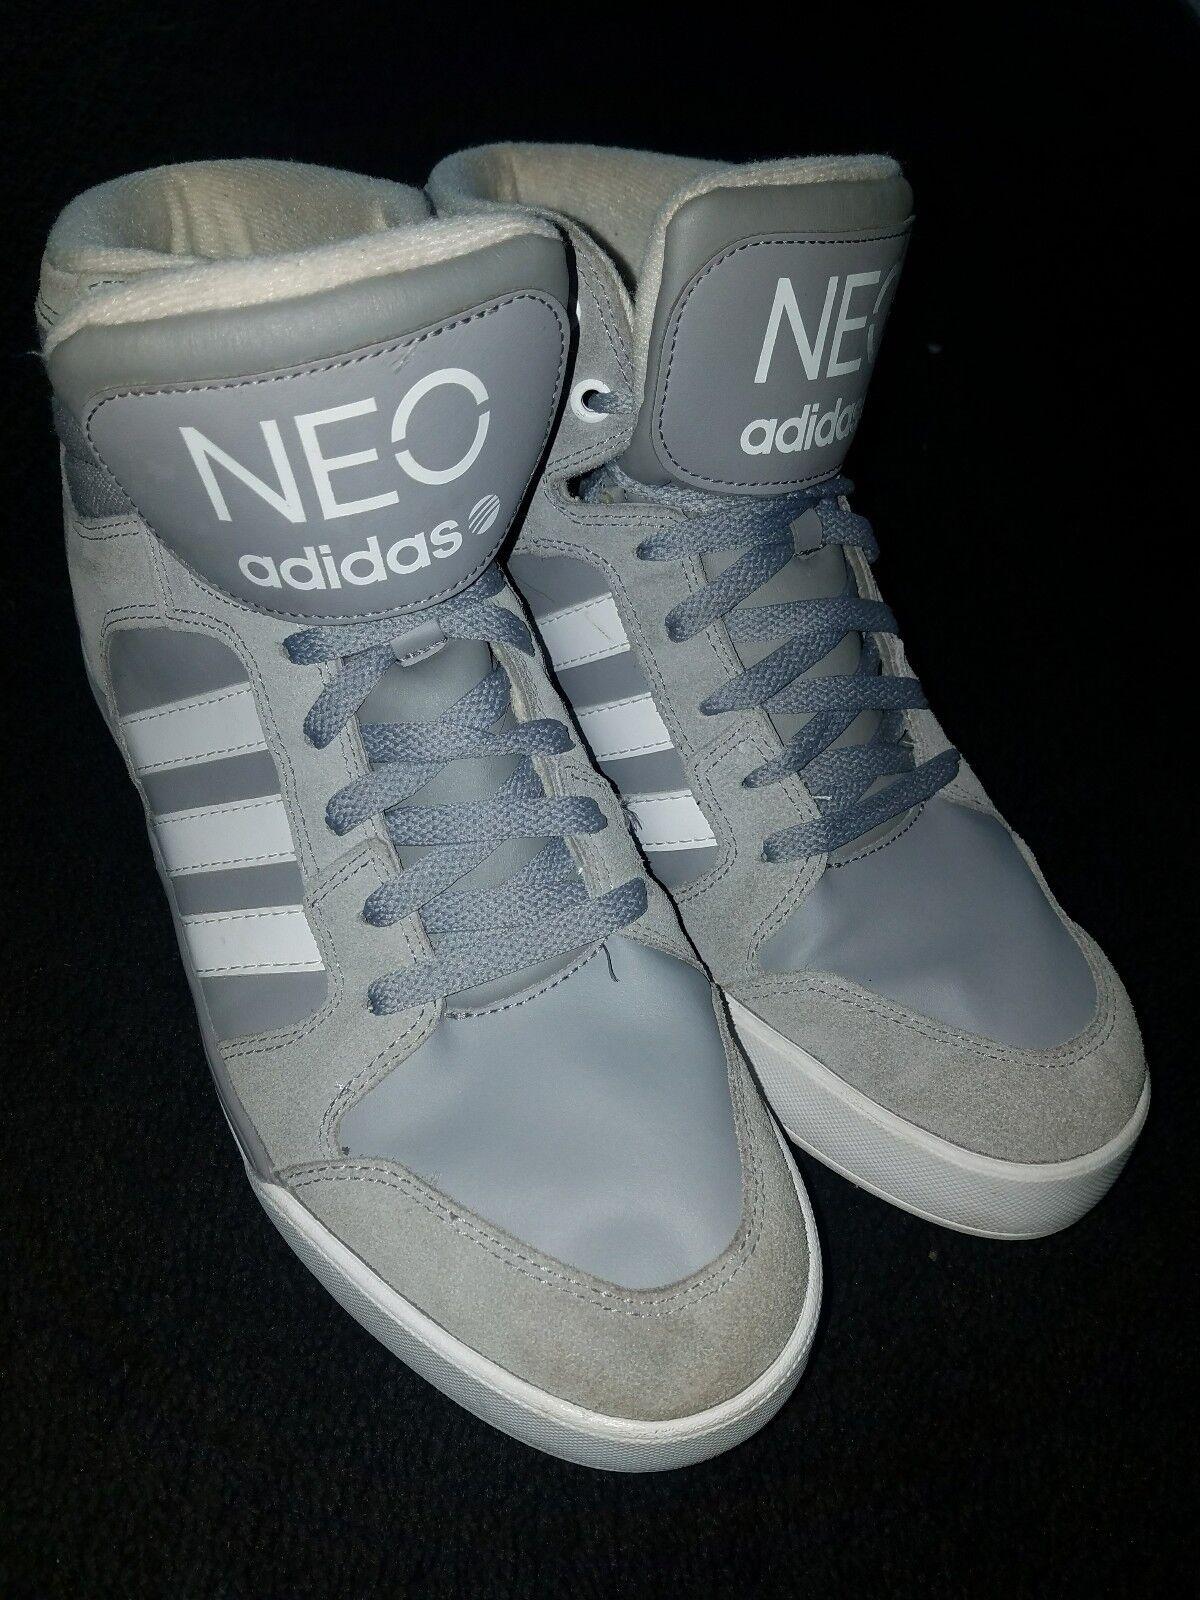 Gray and White Neo Adidas size 10.5 Seasonal price cuts, discount benefits